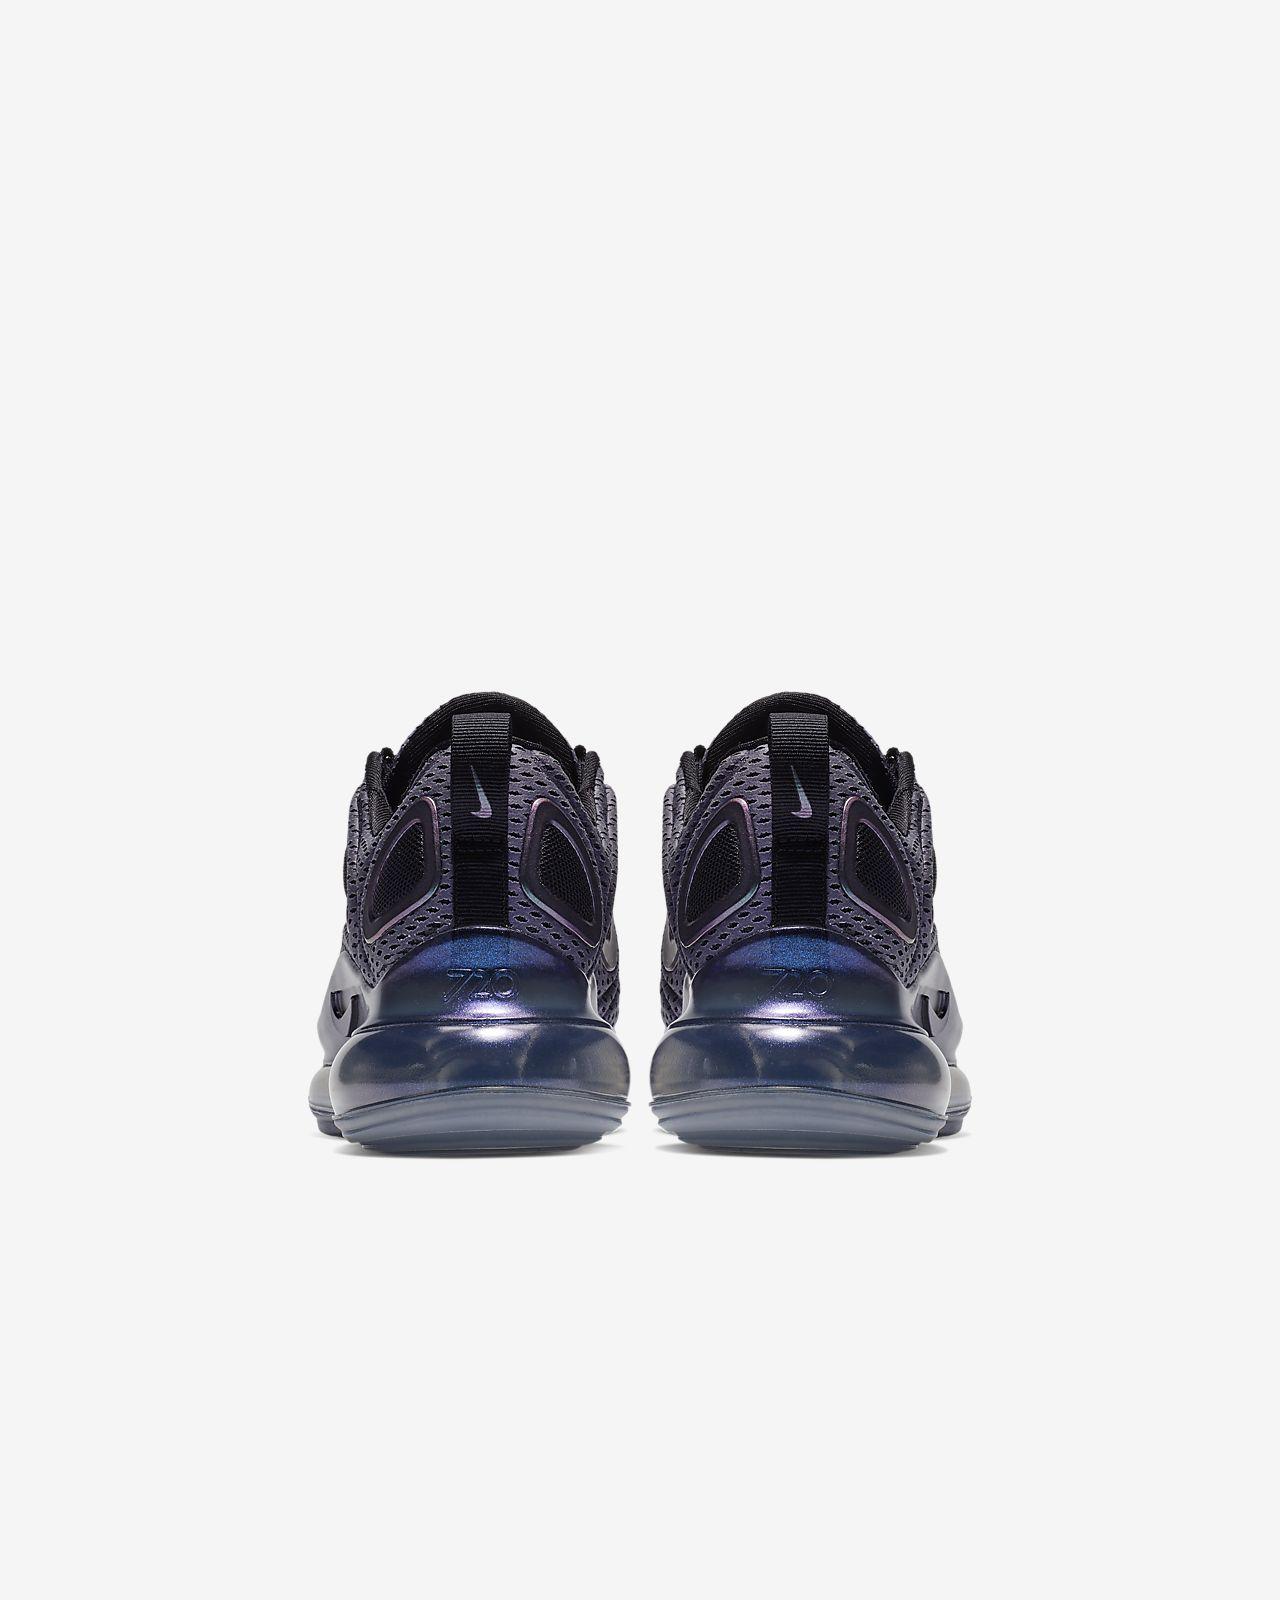 super popular 4a09b aa2b0 ... Nike Air Max 720 Little Big Kids  Shoe